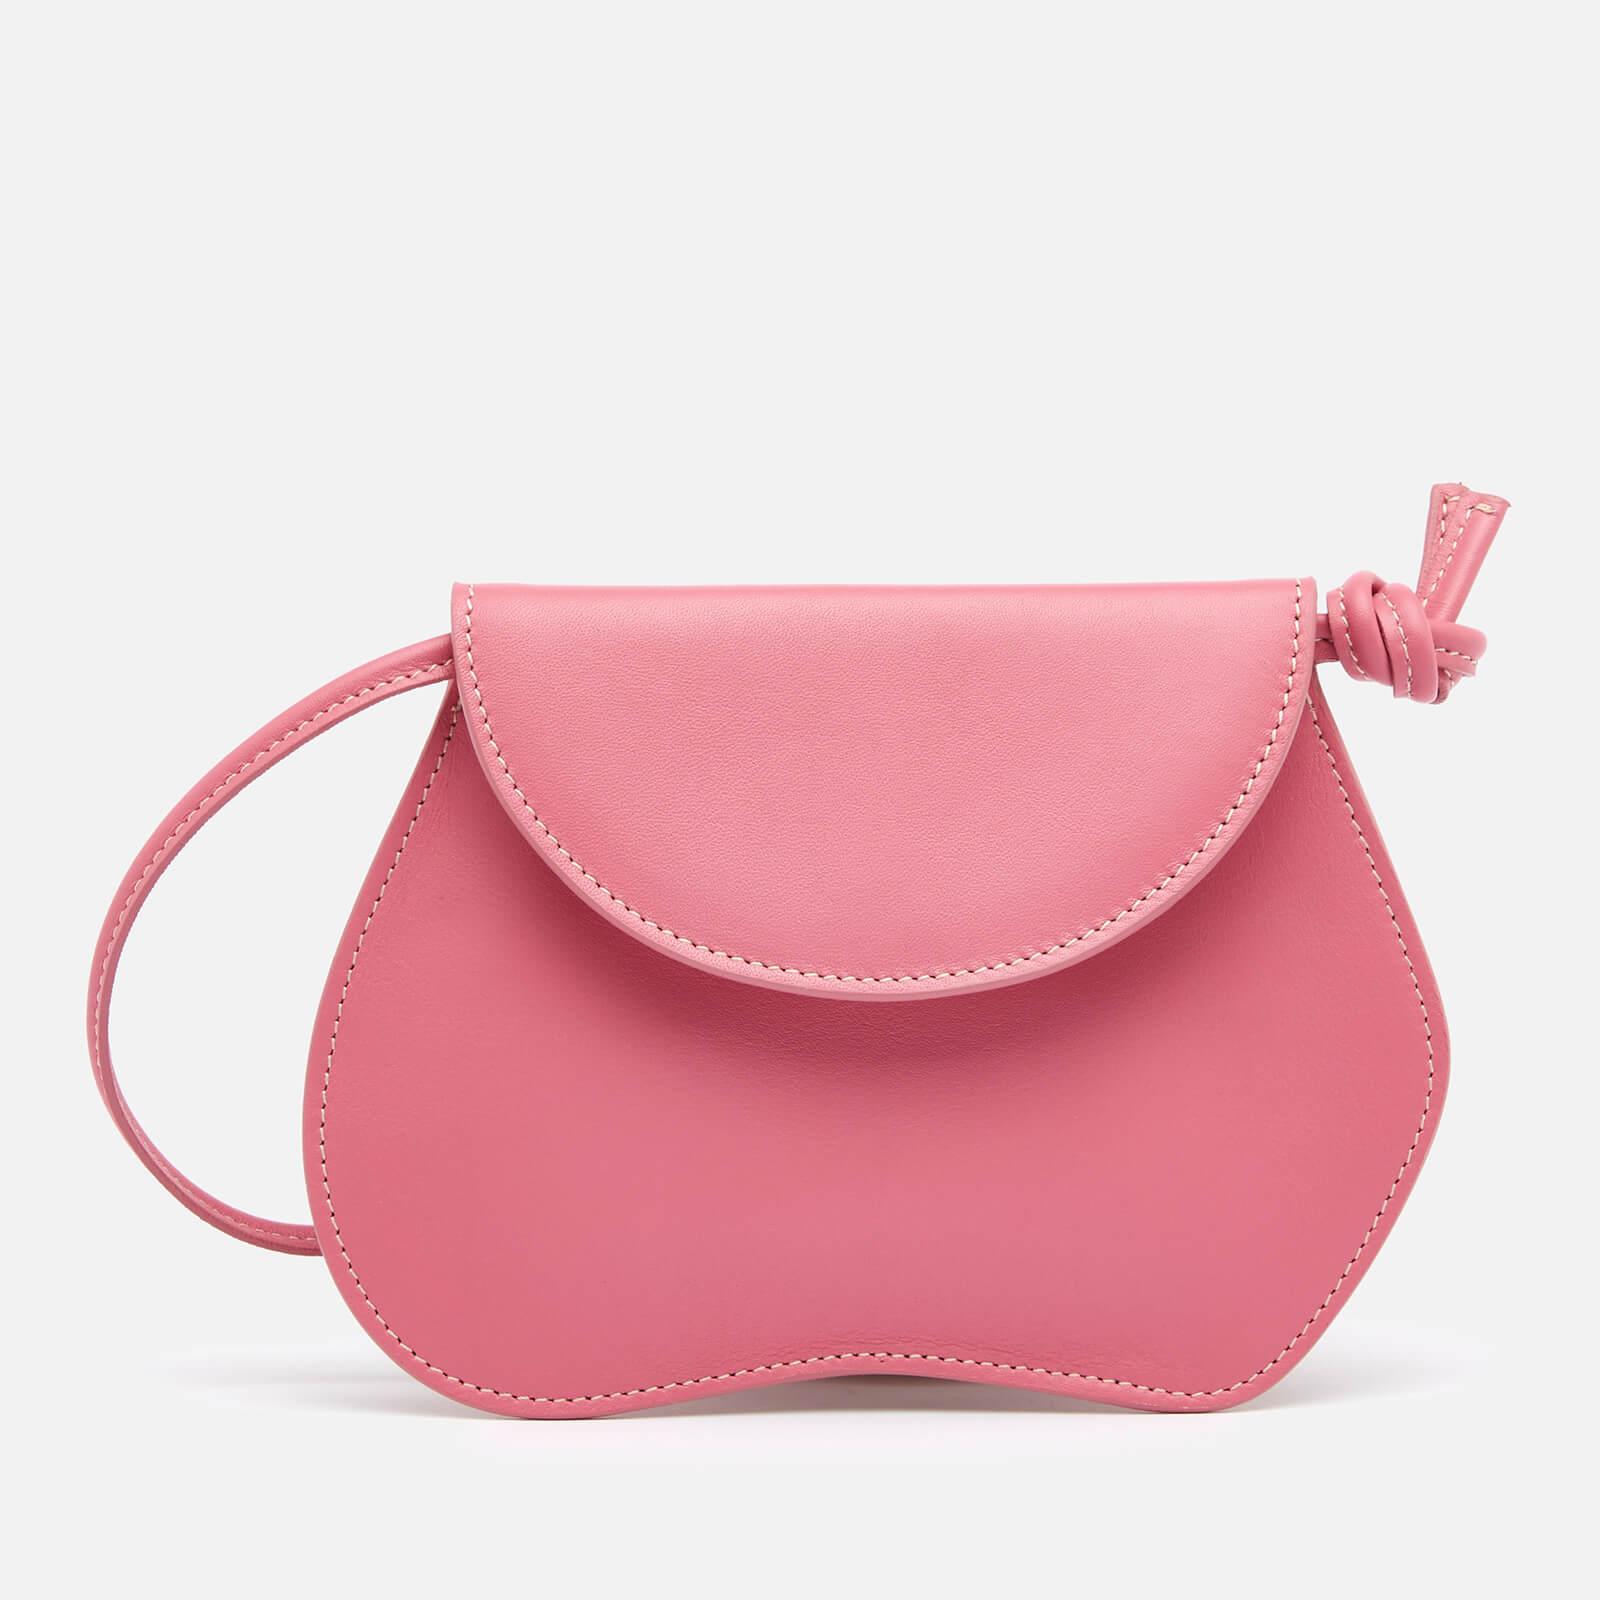 Little Liffner Women's Pebble Micro Bag - Pink